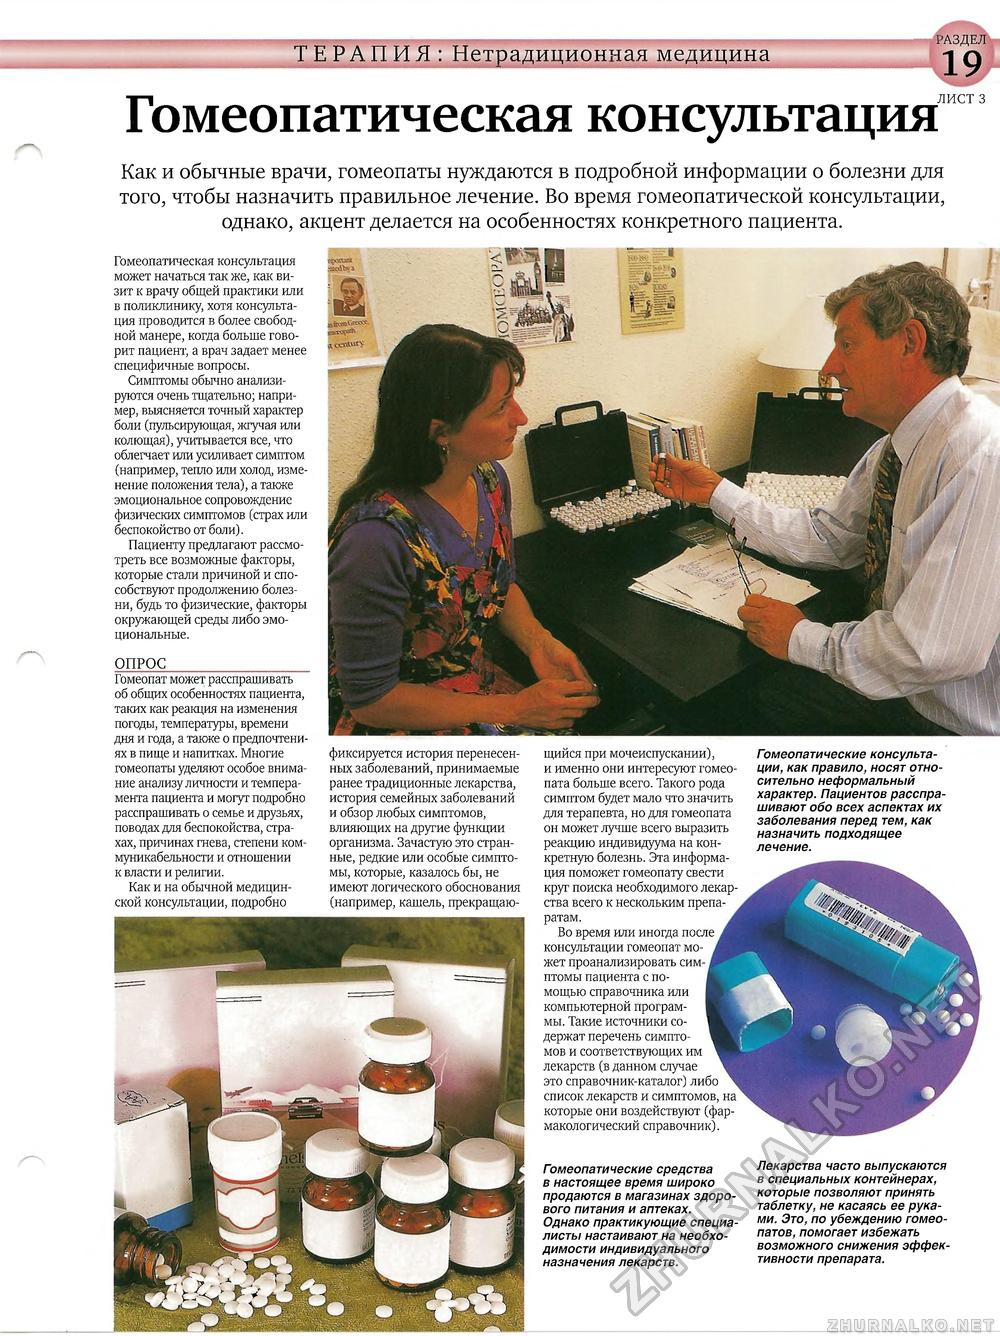 b2b4f208ae6b РАЗДЕЛ   Гомеопатическая консультация - Тело человека №24, страница 11